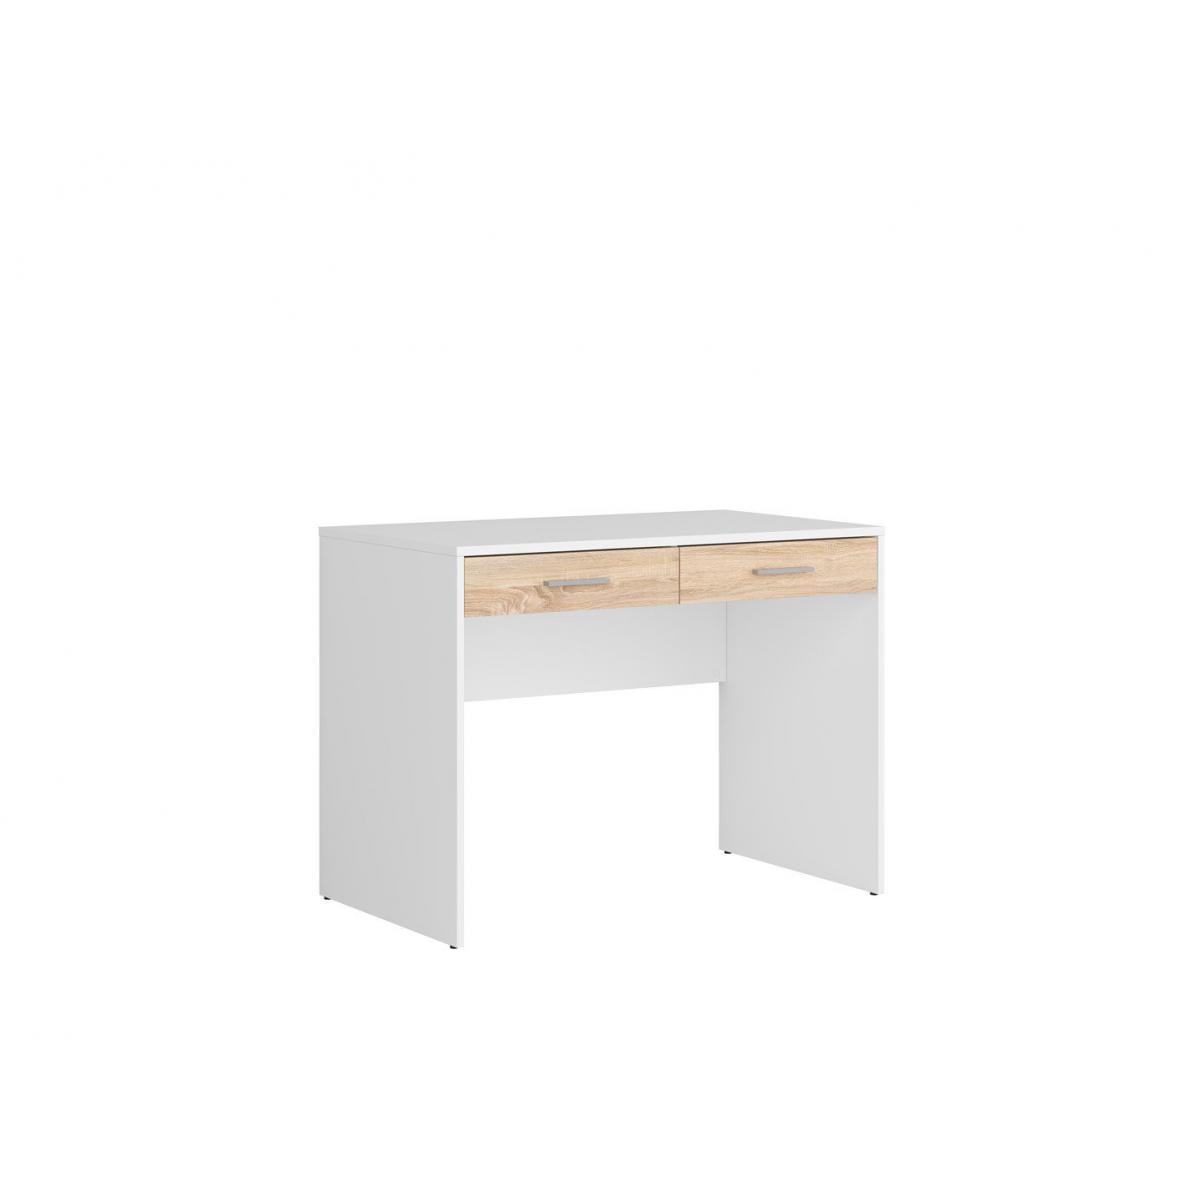 Hucoco AGATTA | Bureau chambre jeune | Style scandinave | 100x76x59 cm| Niche ouverte | 2 Tiroir spacieux - Blanc/Sonoma